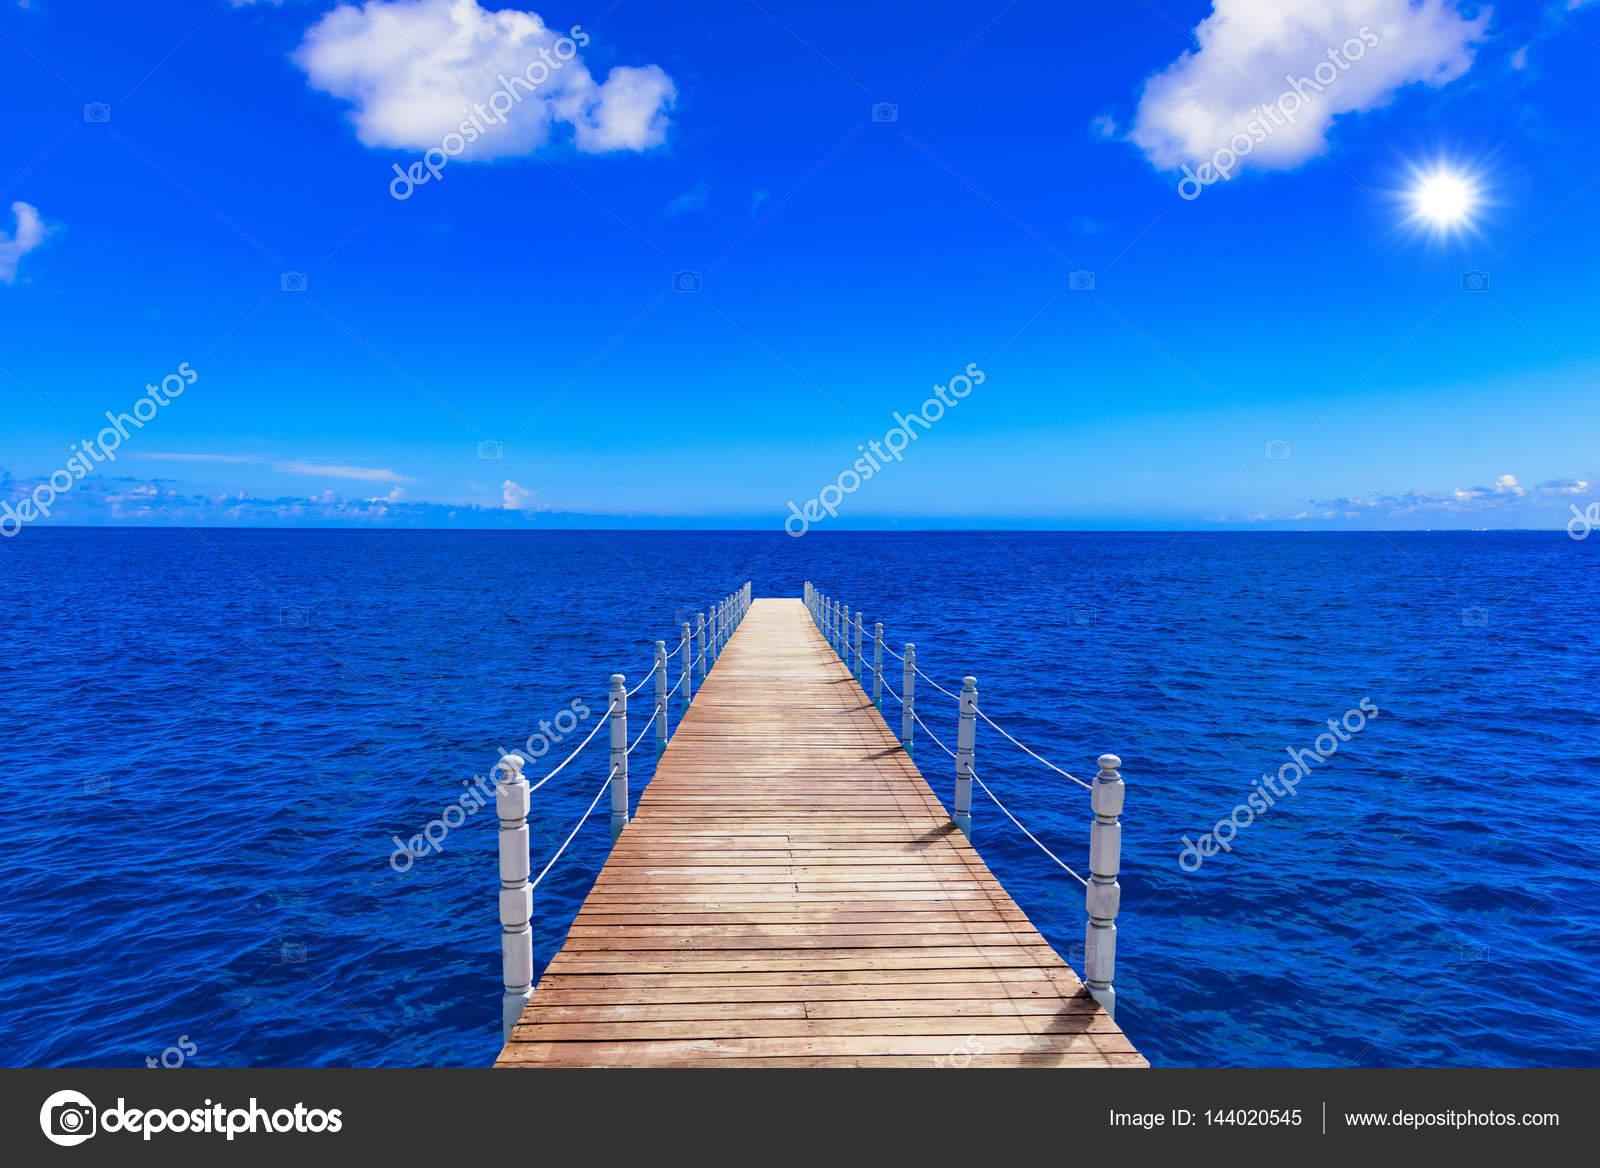 pont en bois s 39 avance dans la mer photographie db rus 144020545. Black Bedroom Furniture Sets. Home Design Ideas